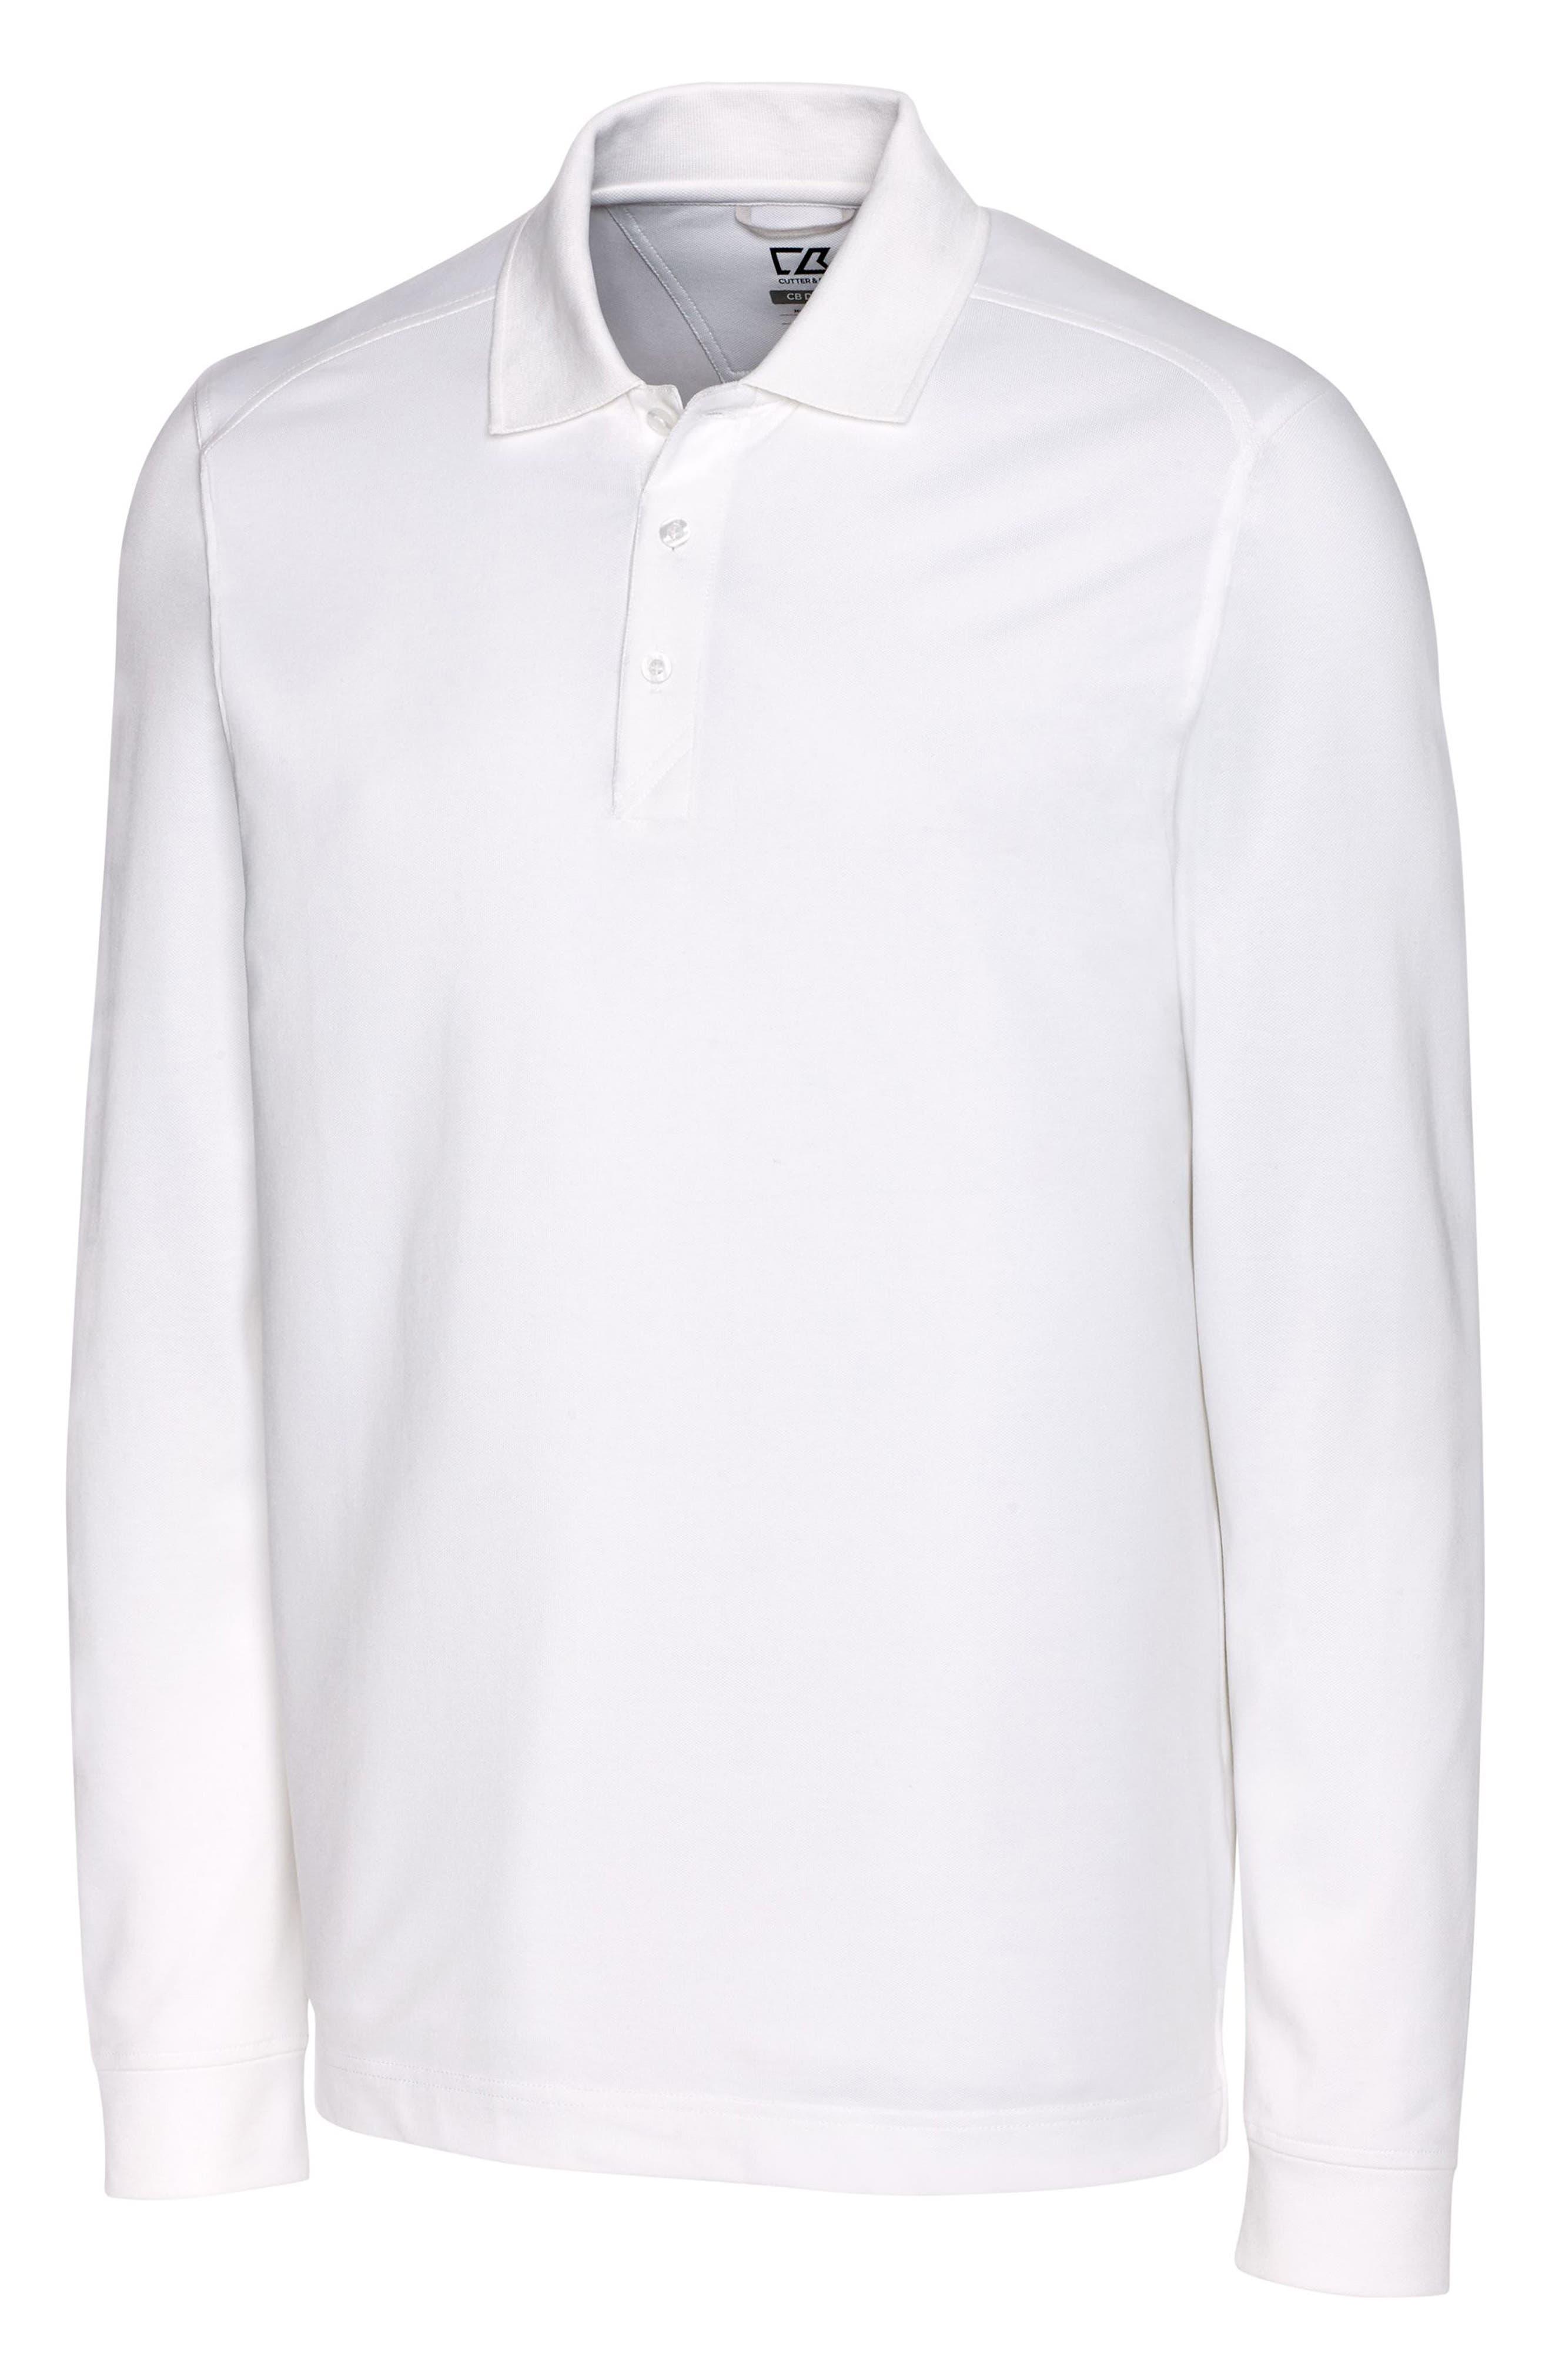 Advantage Long Sleeve Pique Performance Polo